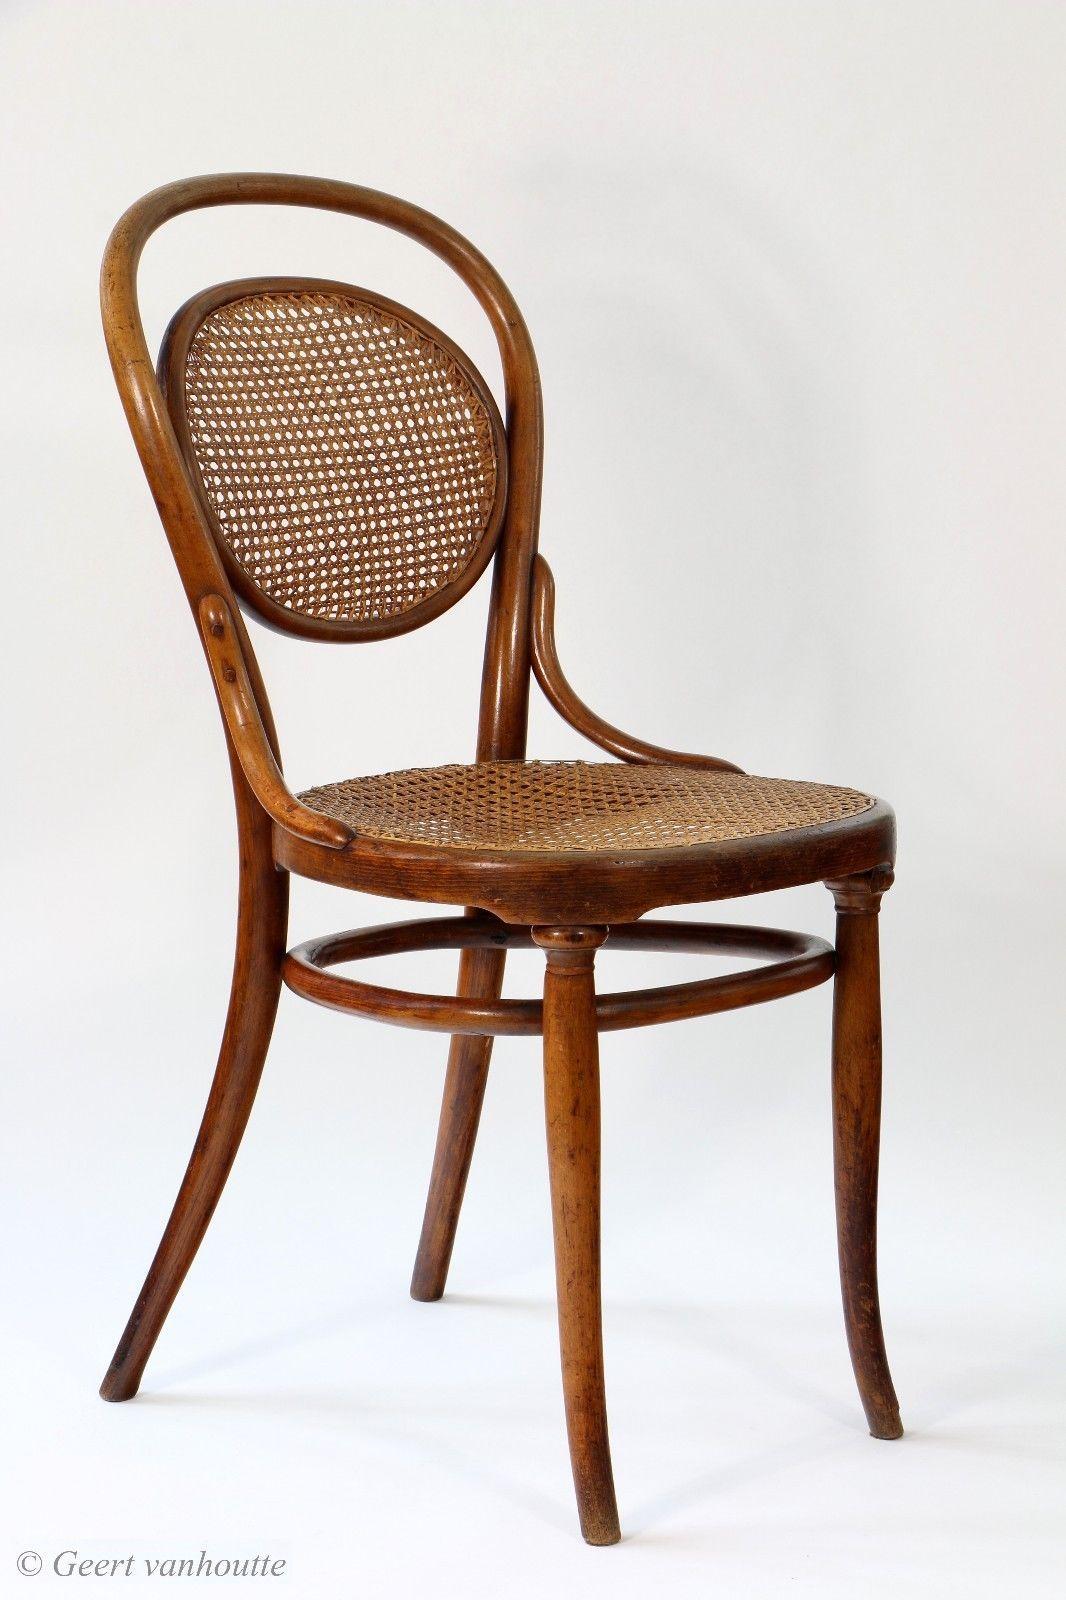 Thonet Sessel Nr 11 Ca 1876 1881 Furniture Rattan Chair